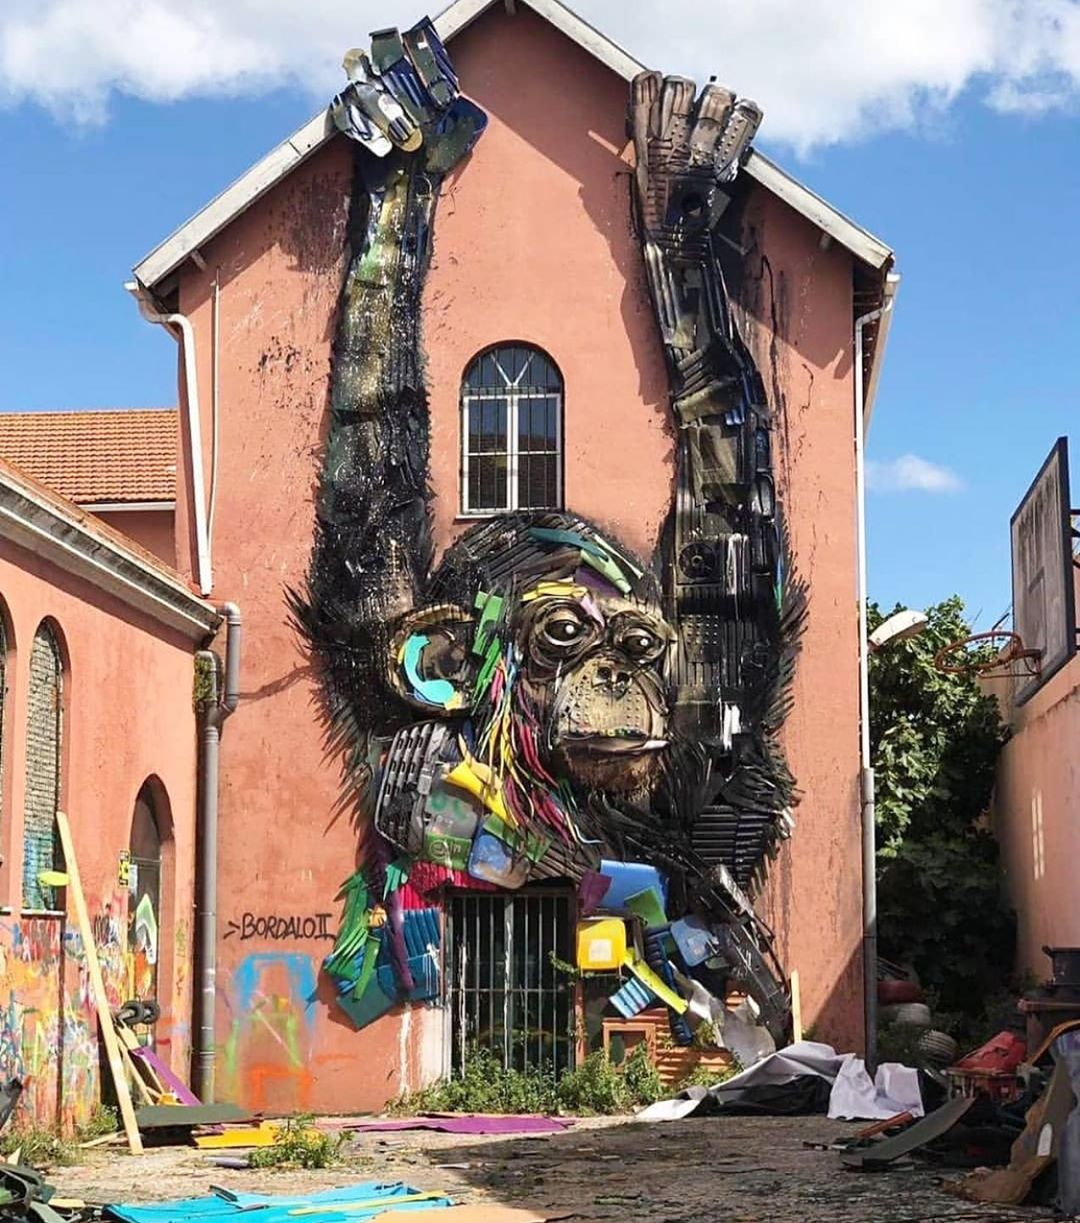 street_art_and_graffiti_64590048_931878373809787_4472319484725589378_n.jpg